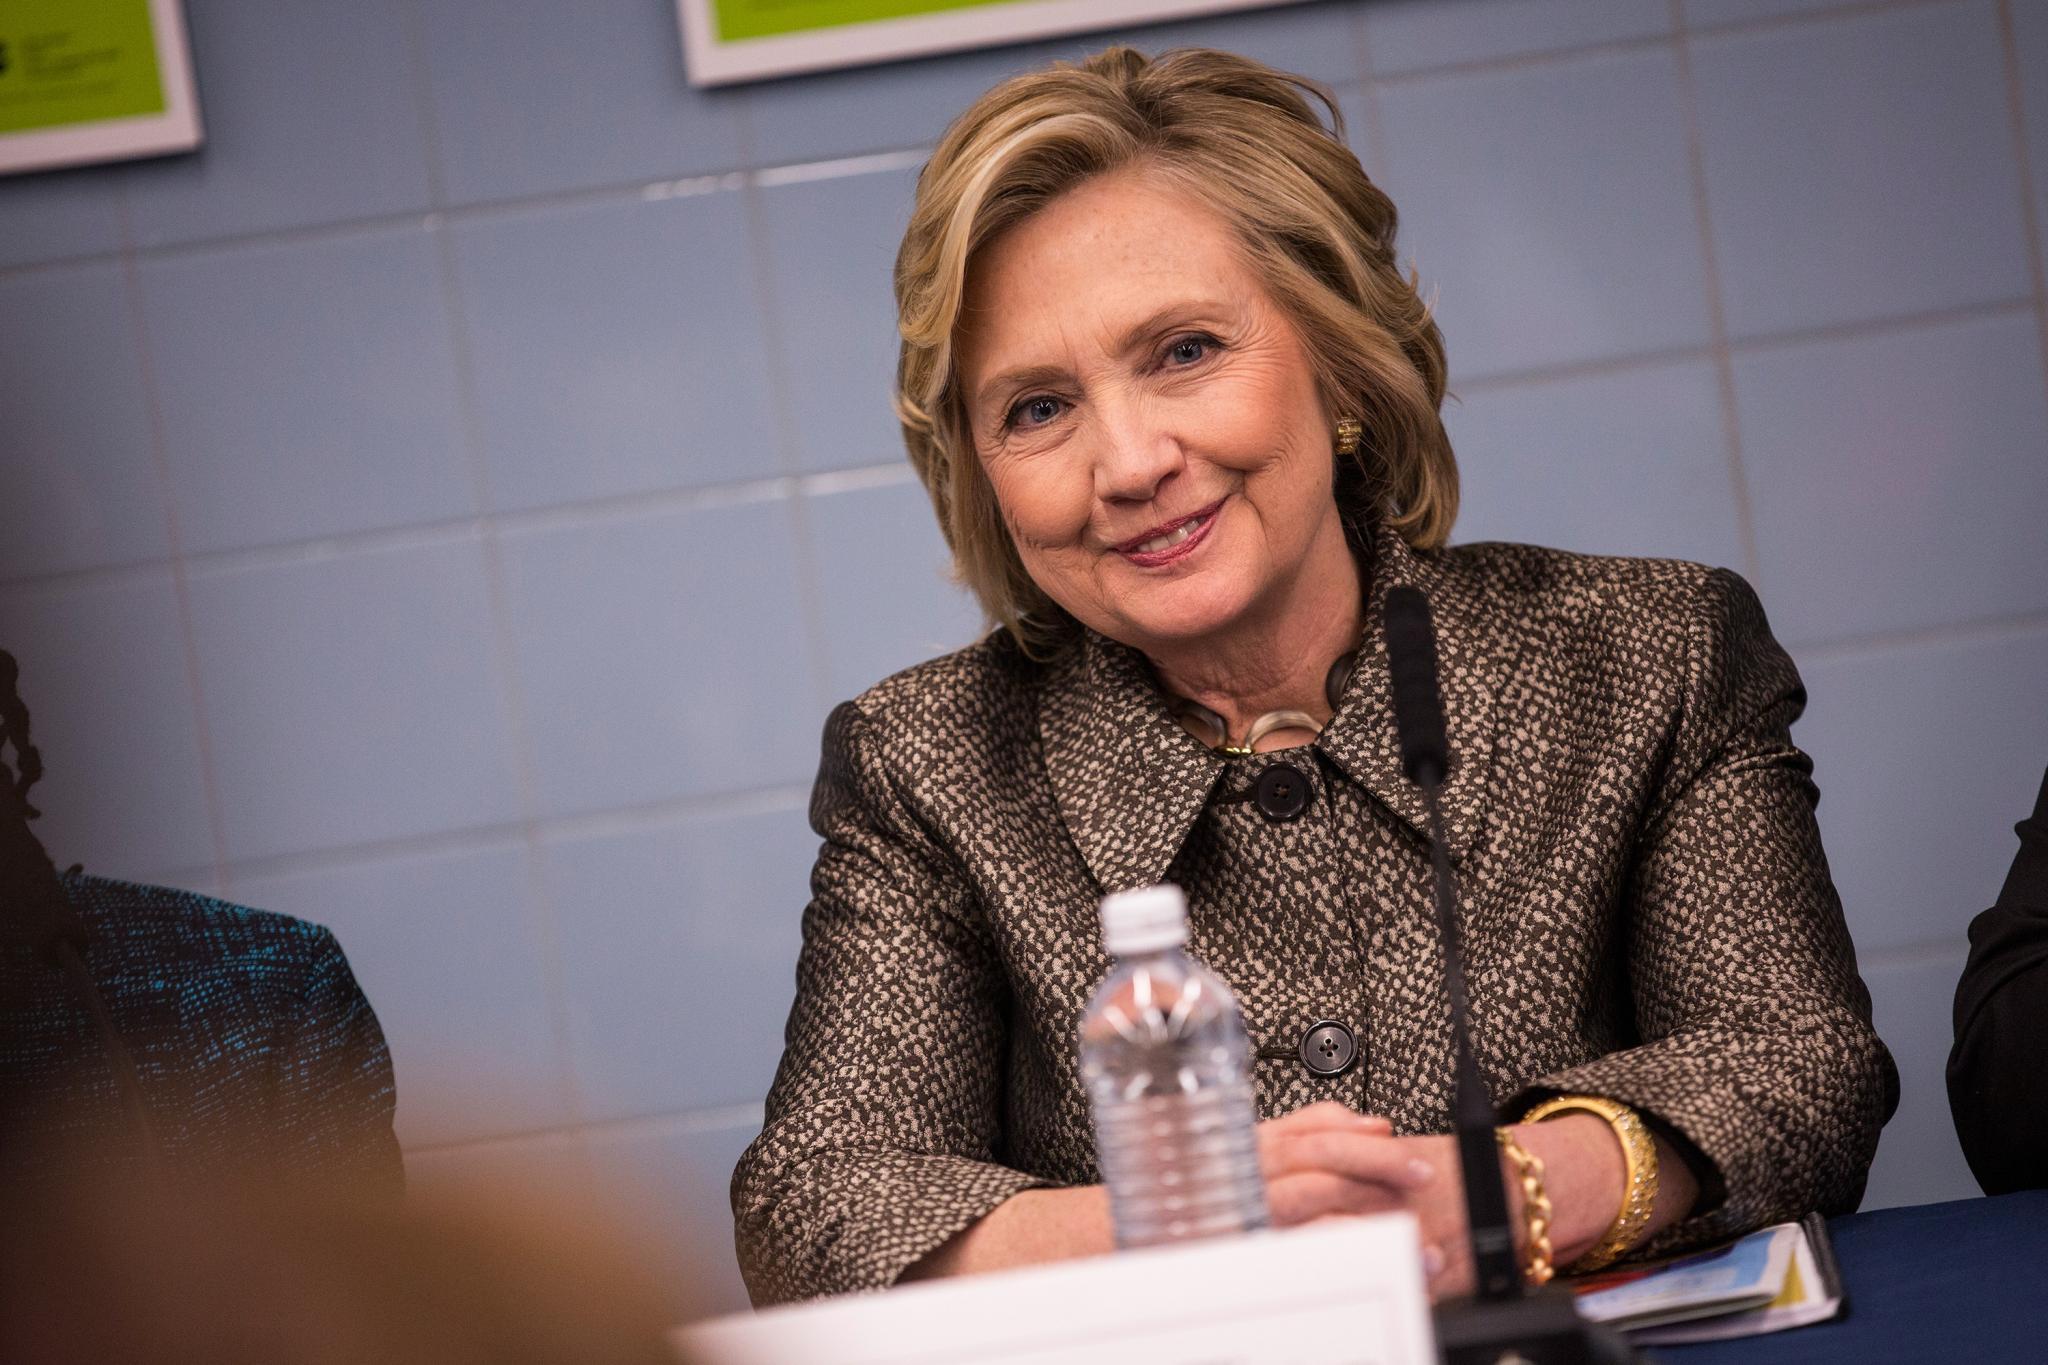 Hillary Clinton Calls for Universal Voter Registration